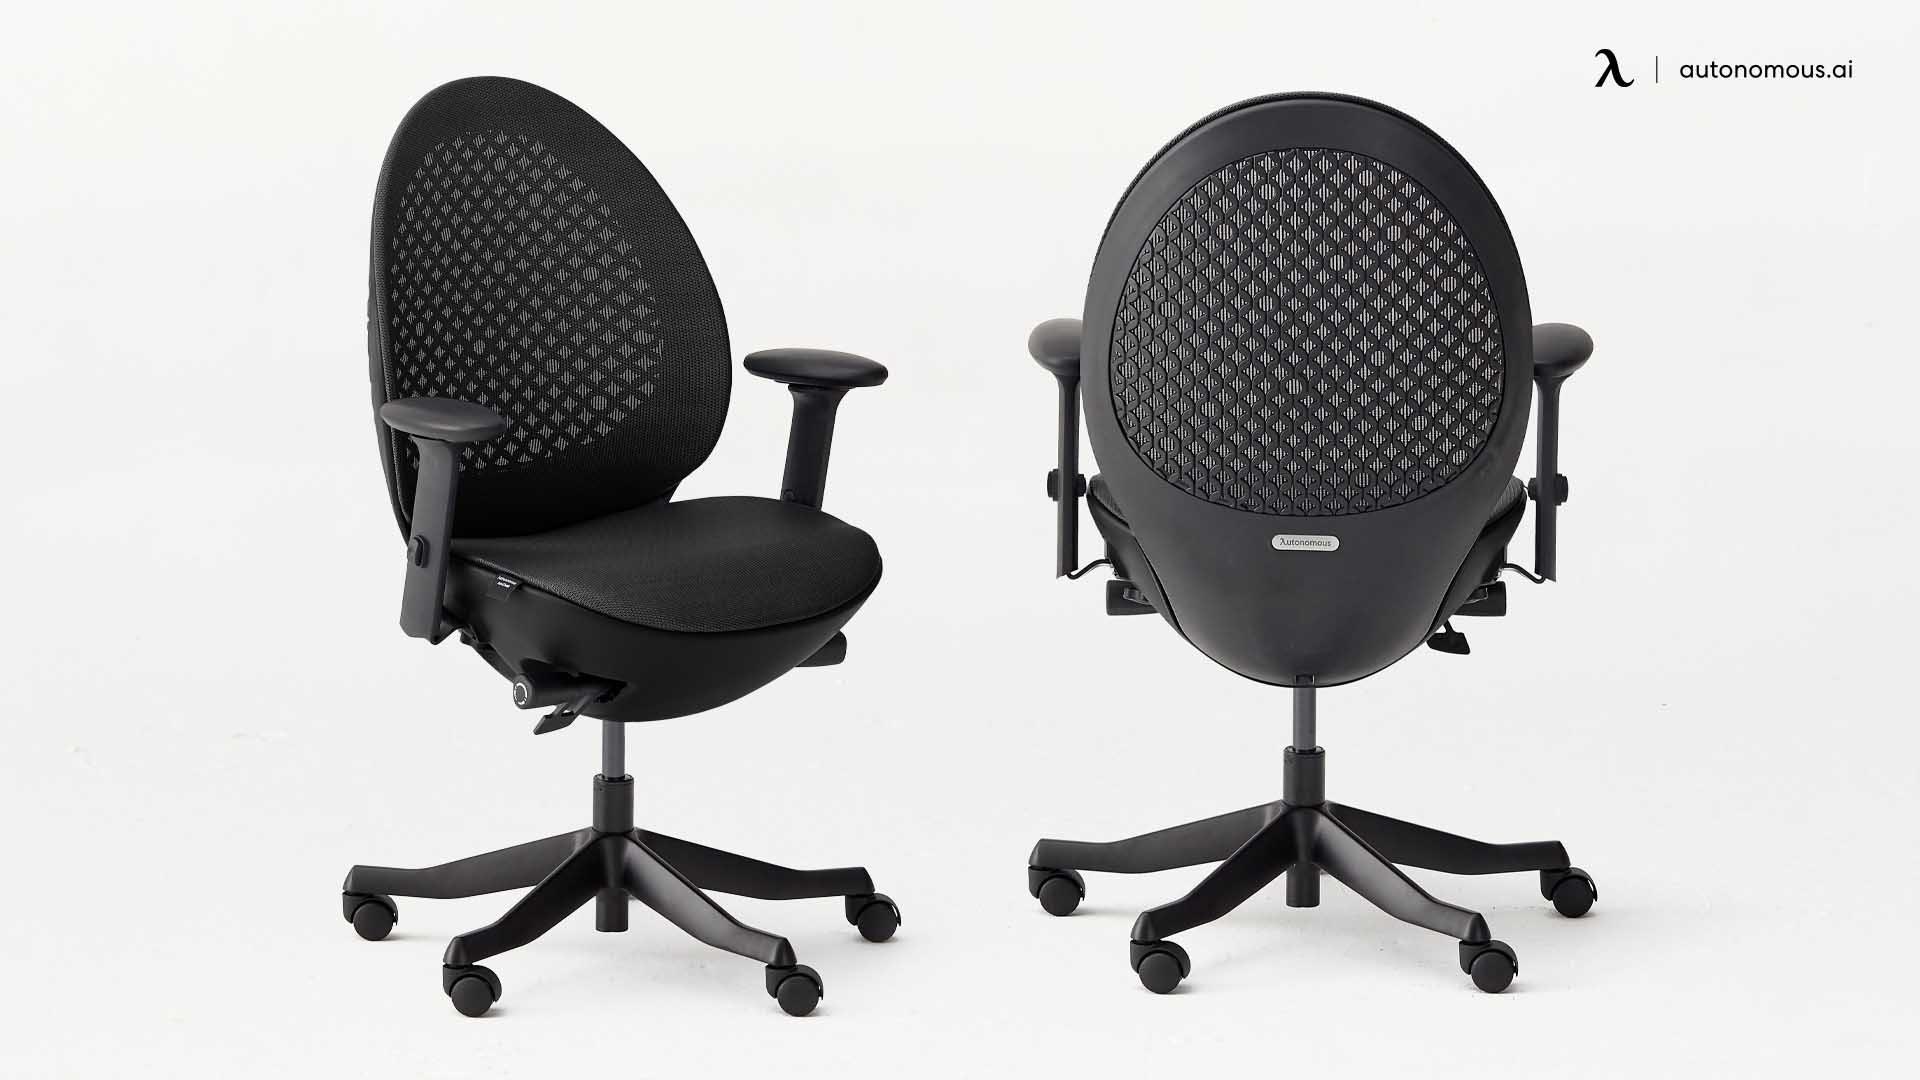 AvoChair - eco-friendly ergonomic chair home office